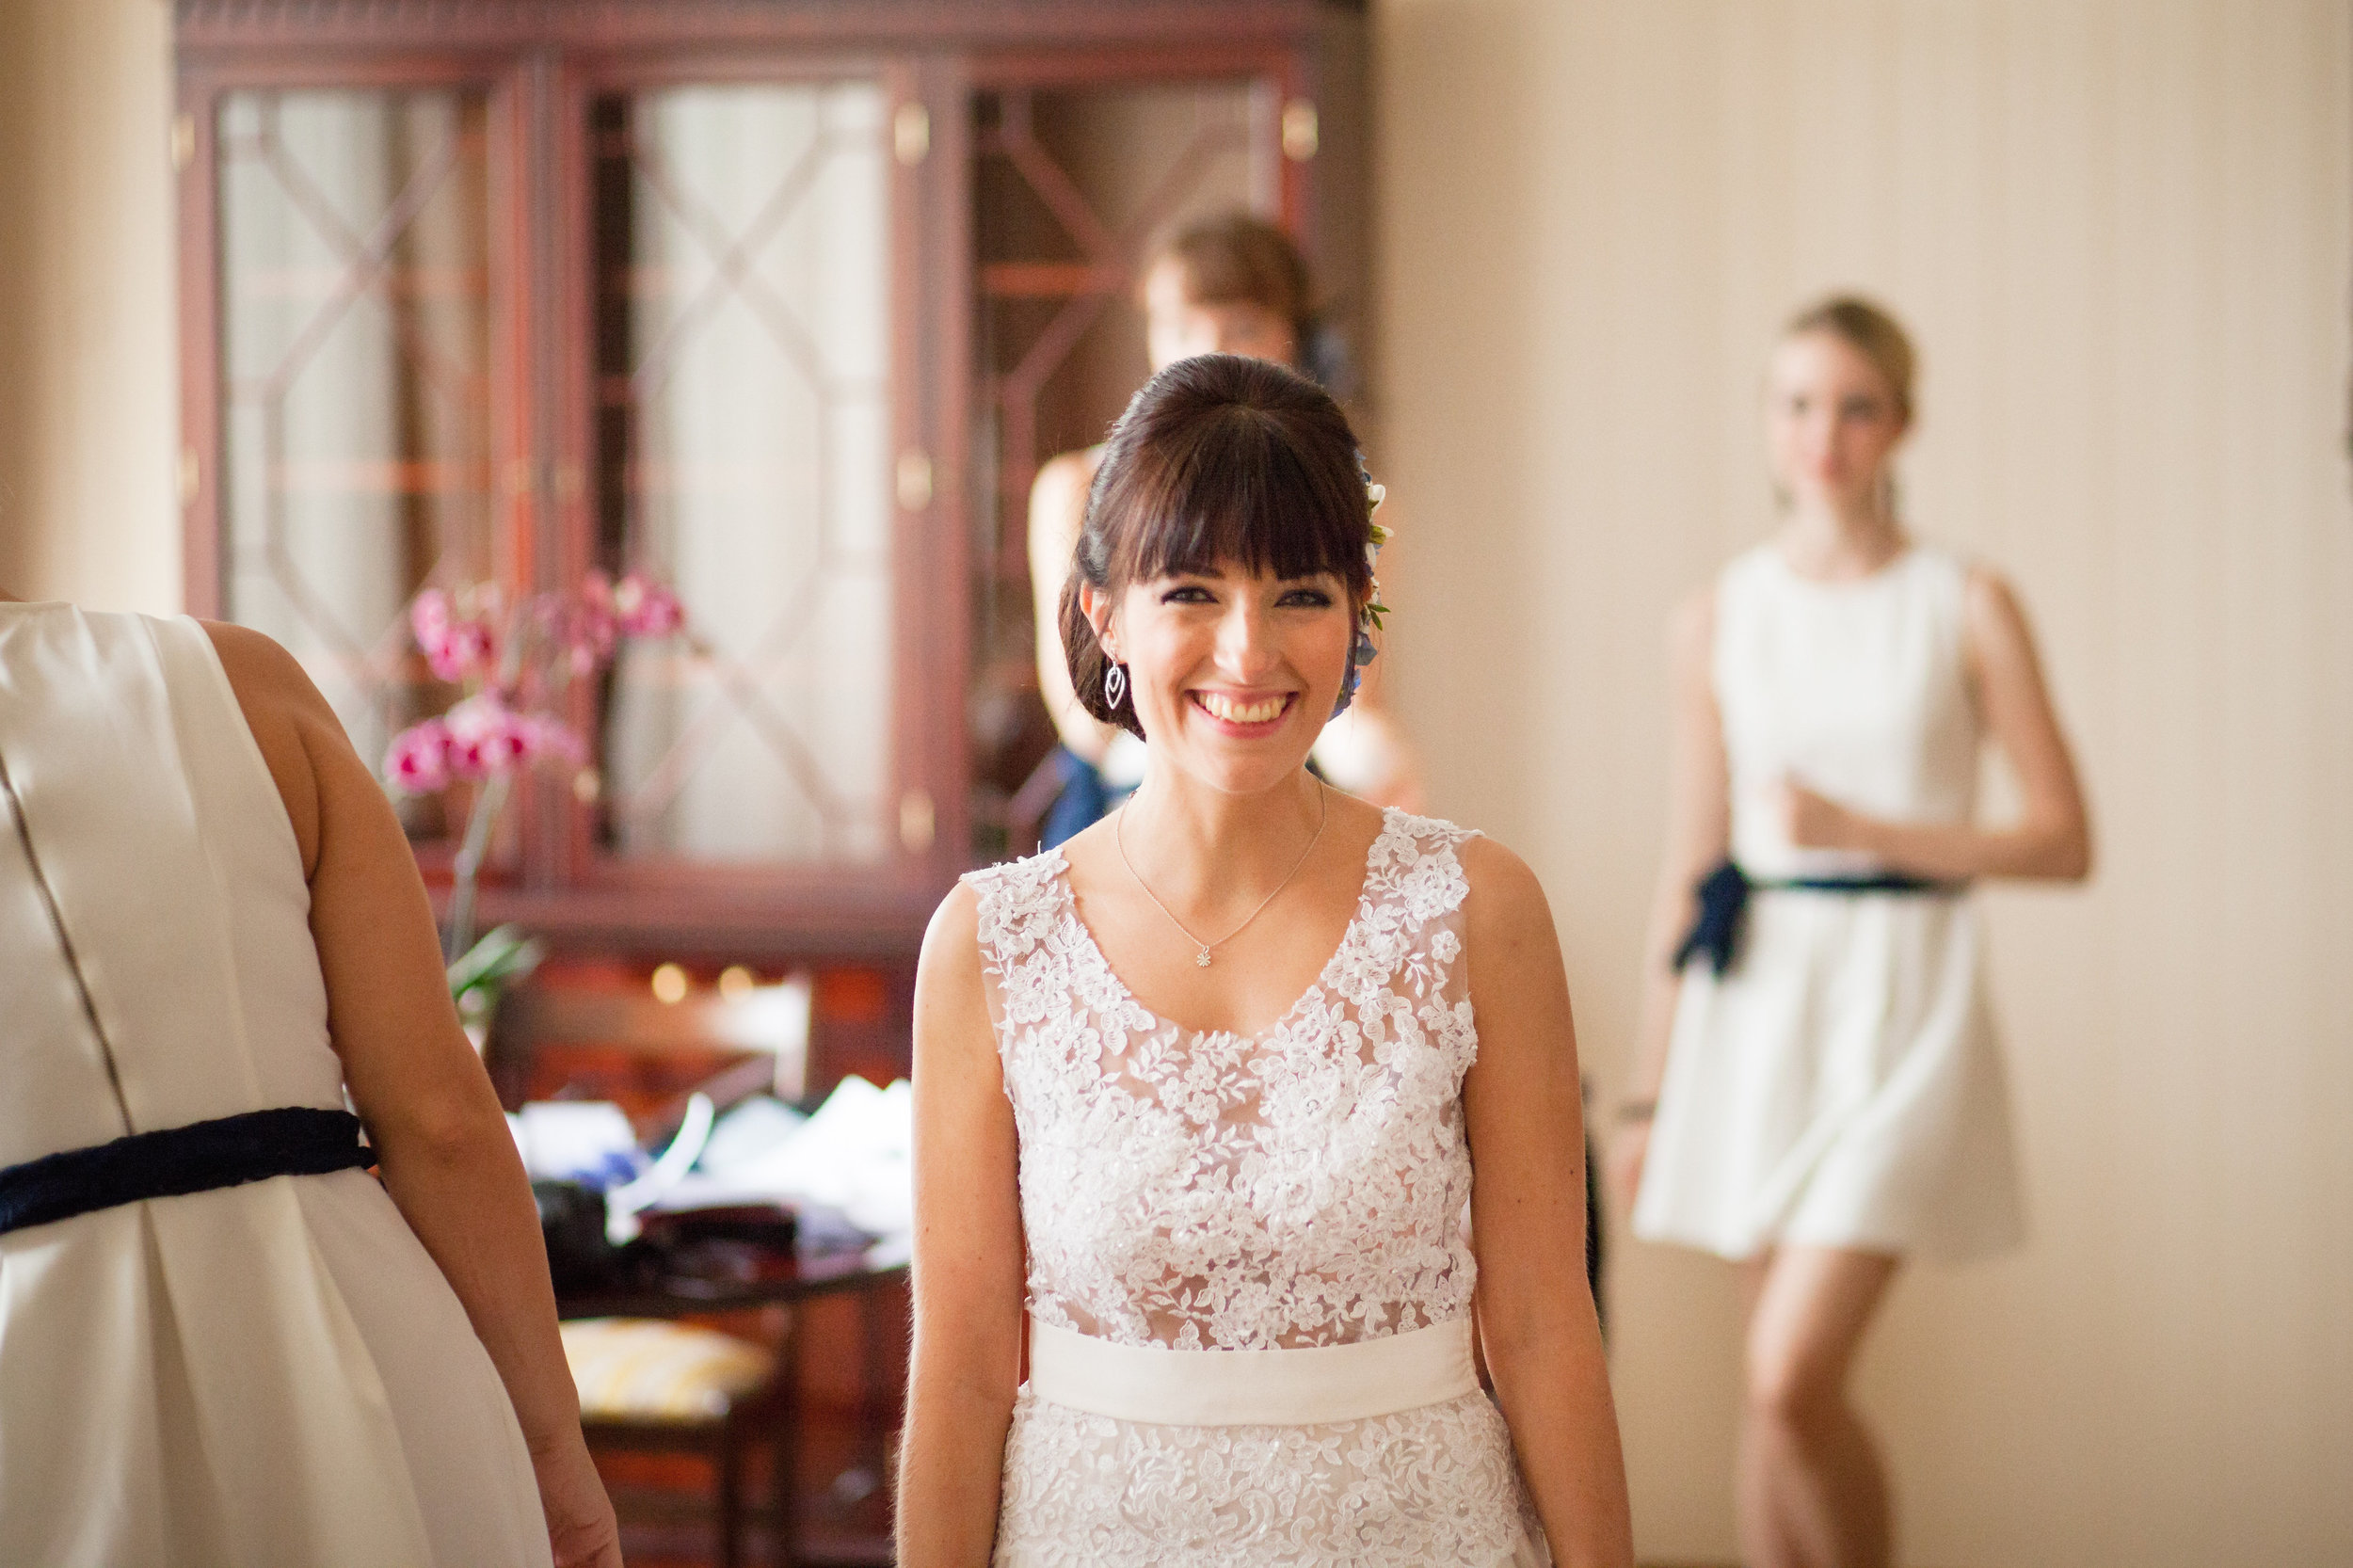 destination-wedding-photographer-bratislava-slovakia-europe-preparation-3.jpg